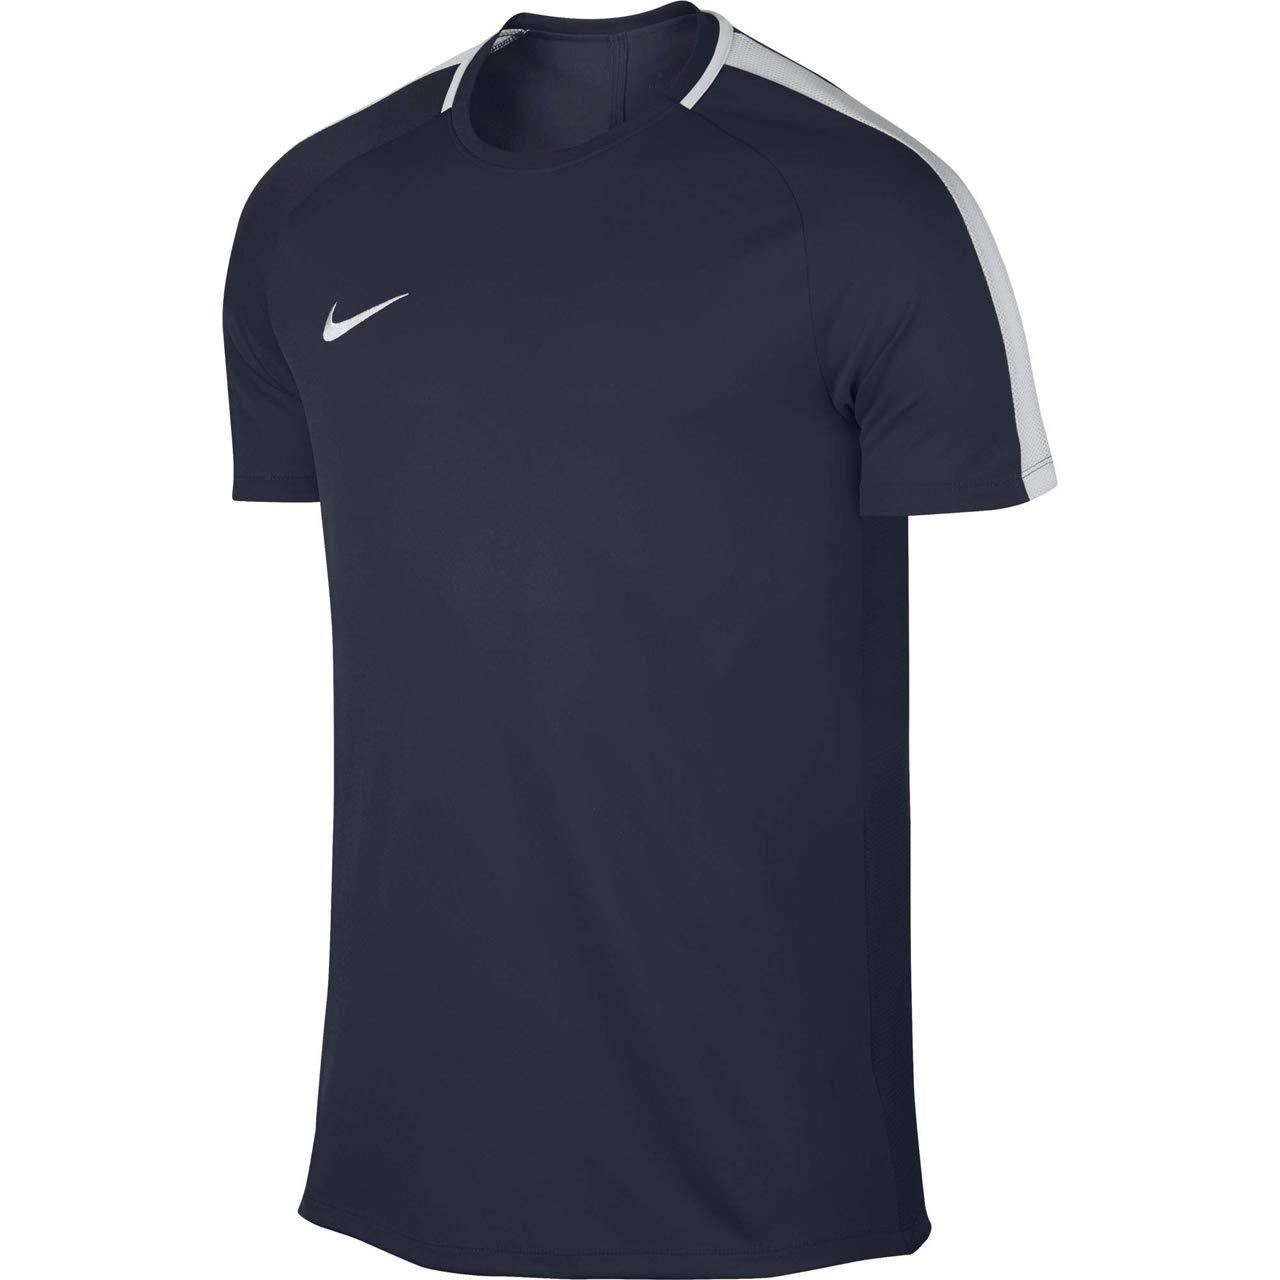 Nike Dri-FIT Academy Mens Soccer Top